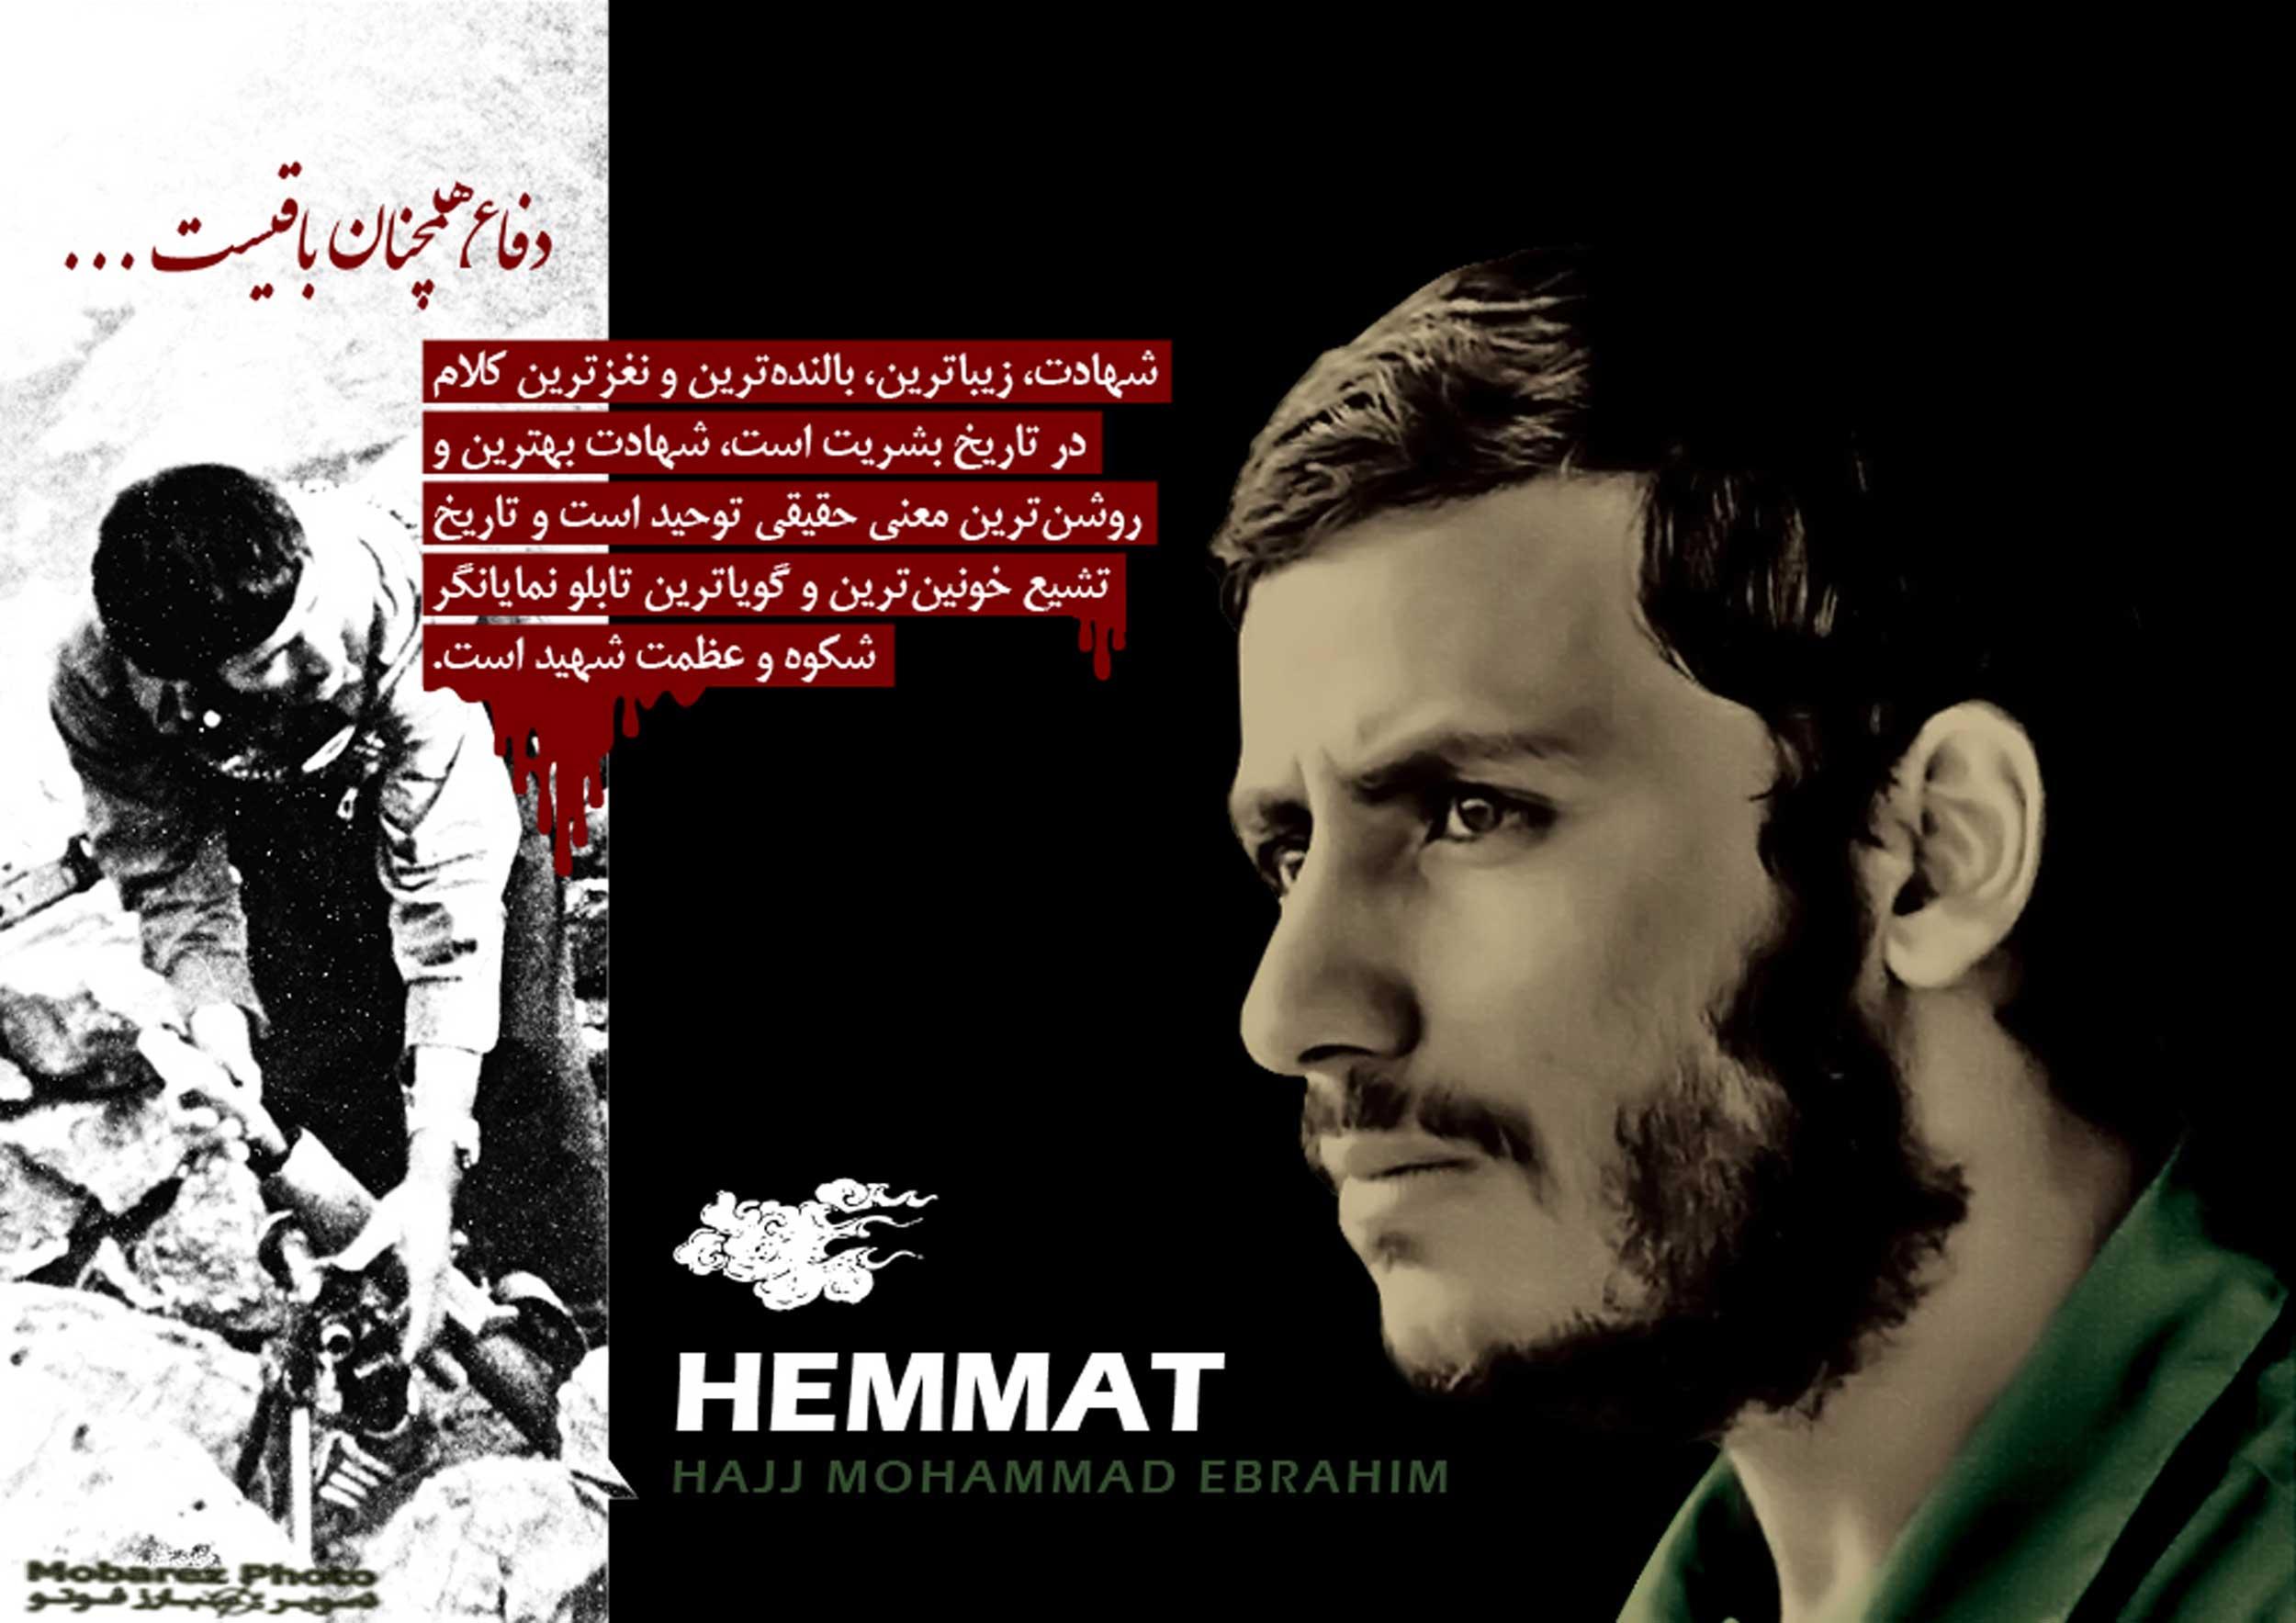 http://dl.aviny.com/Album/defa-moghadas/shohada/hemat/kamel/12.jpg